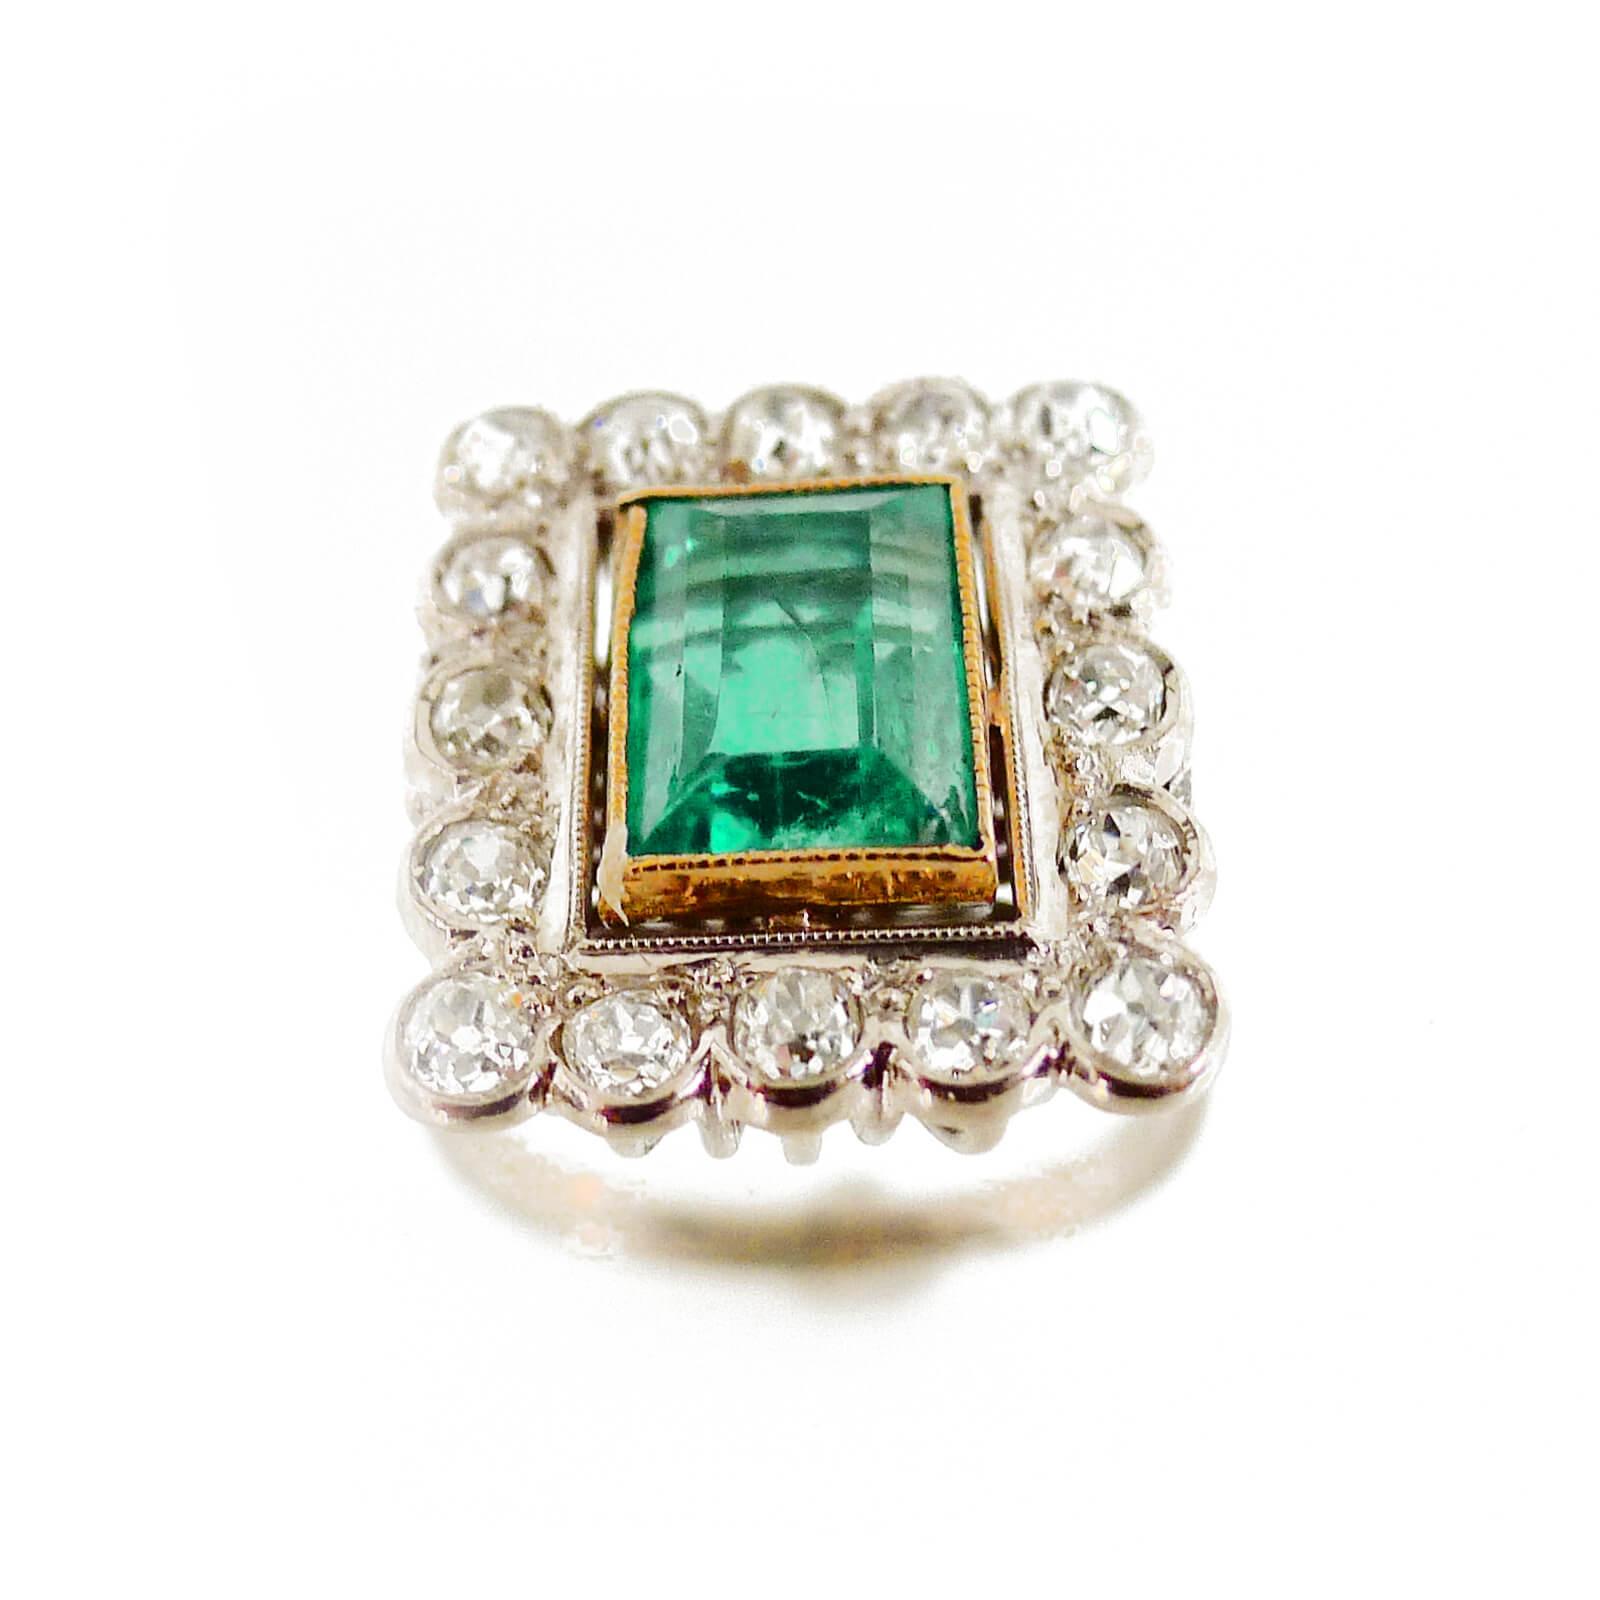 Edwardian Emerald & Diamond Ring